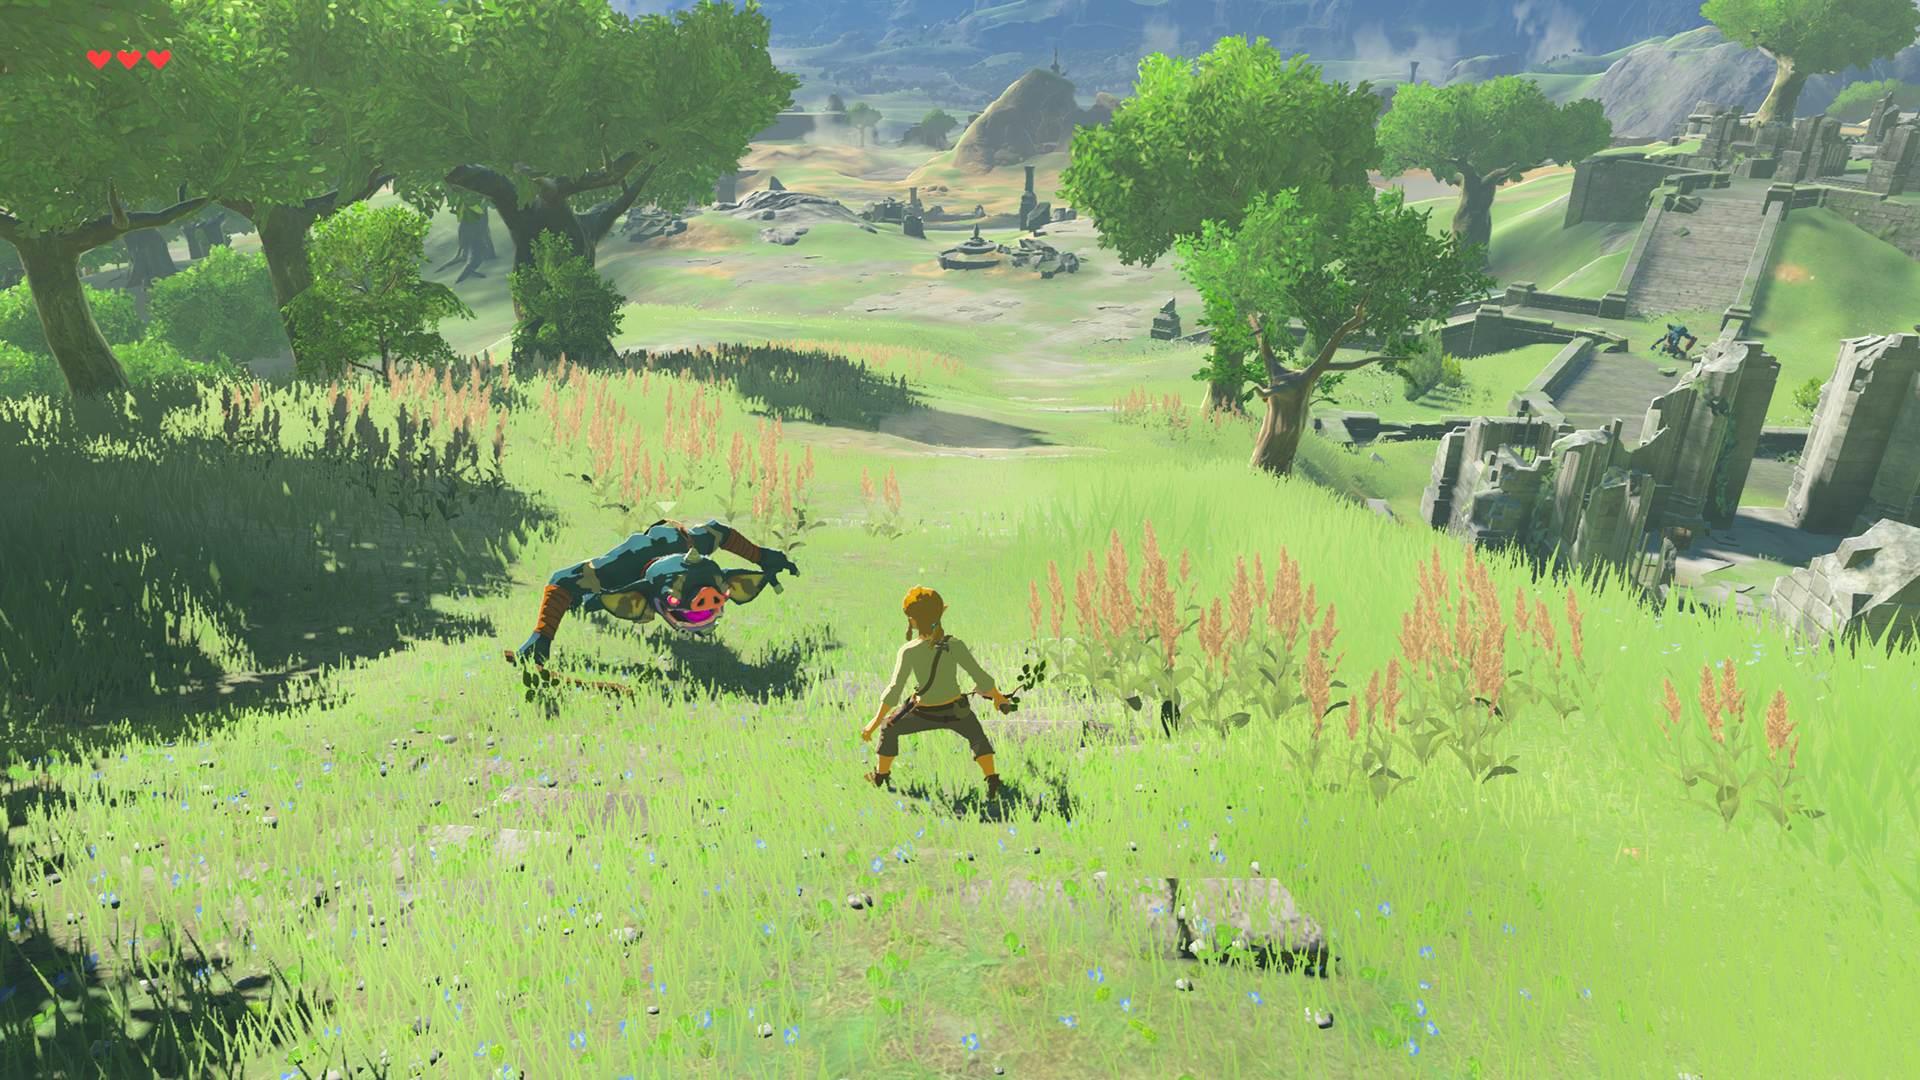 Zelda_Screenshot2.jpg